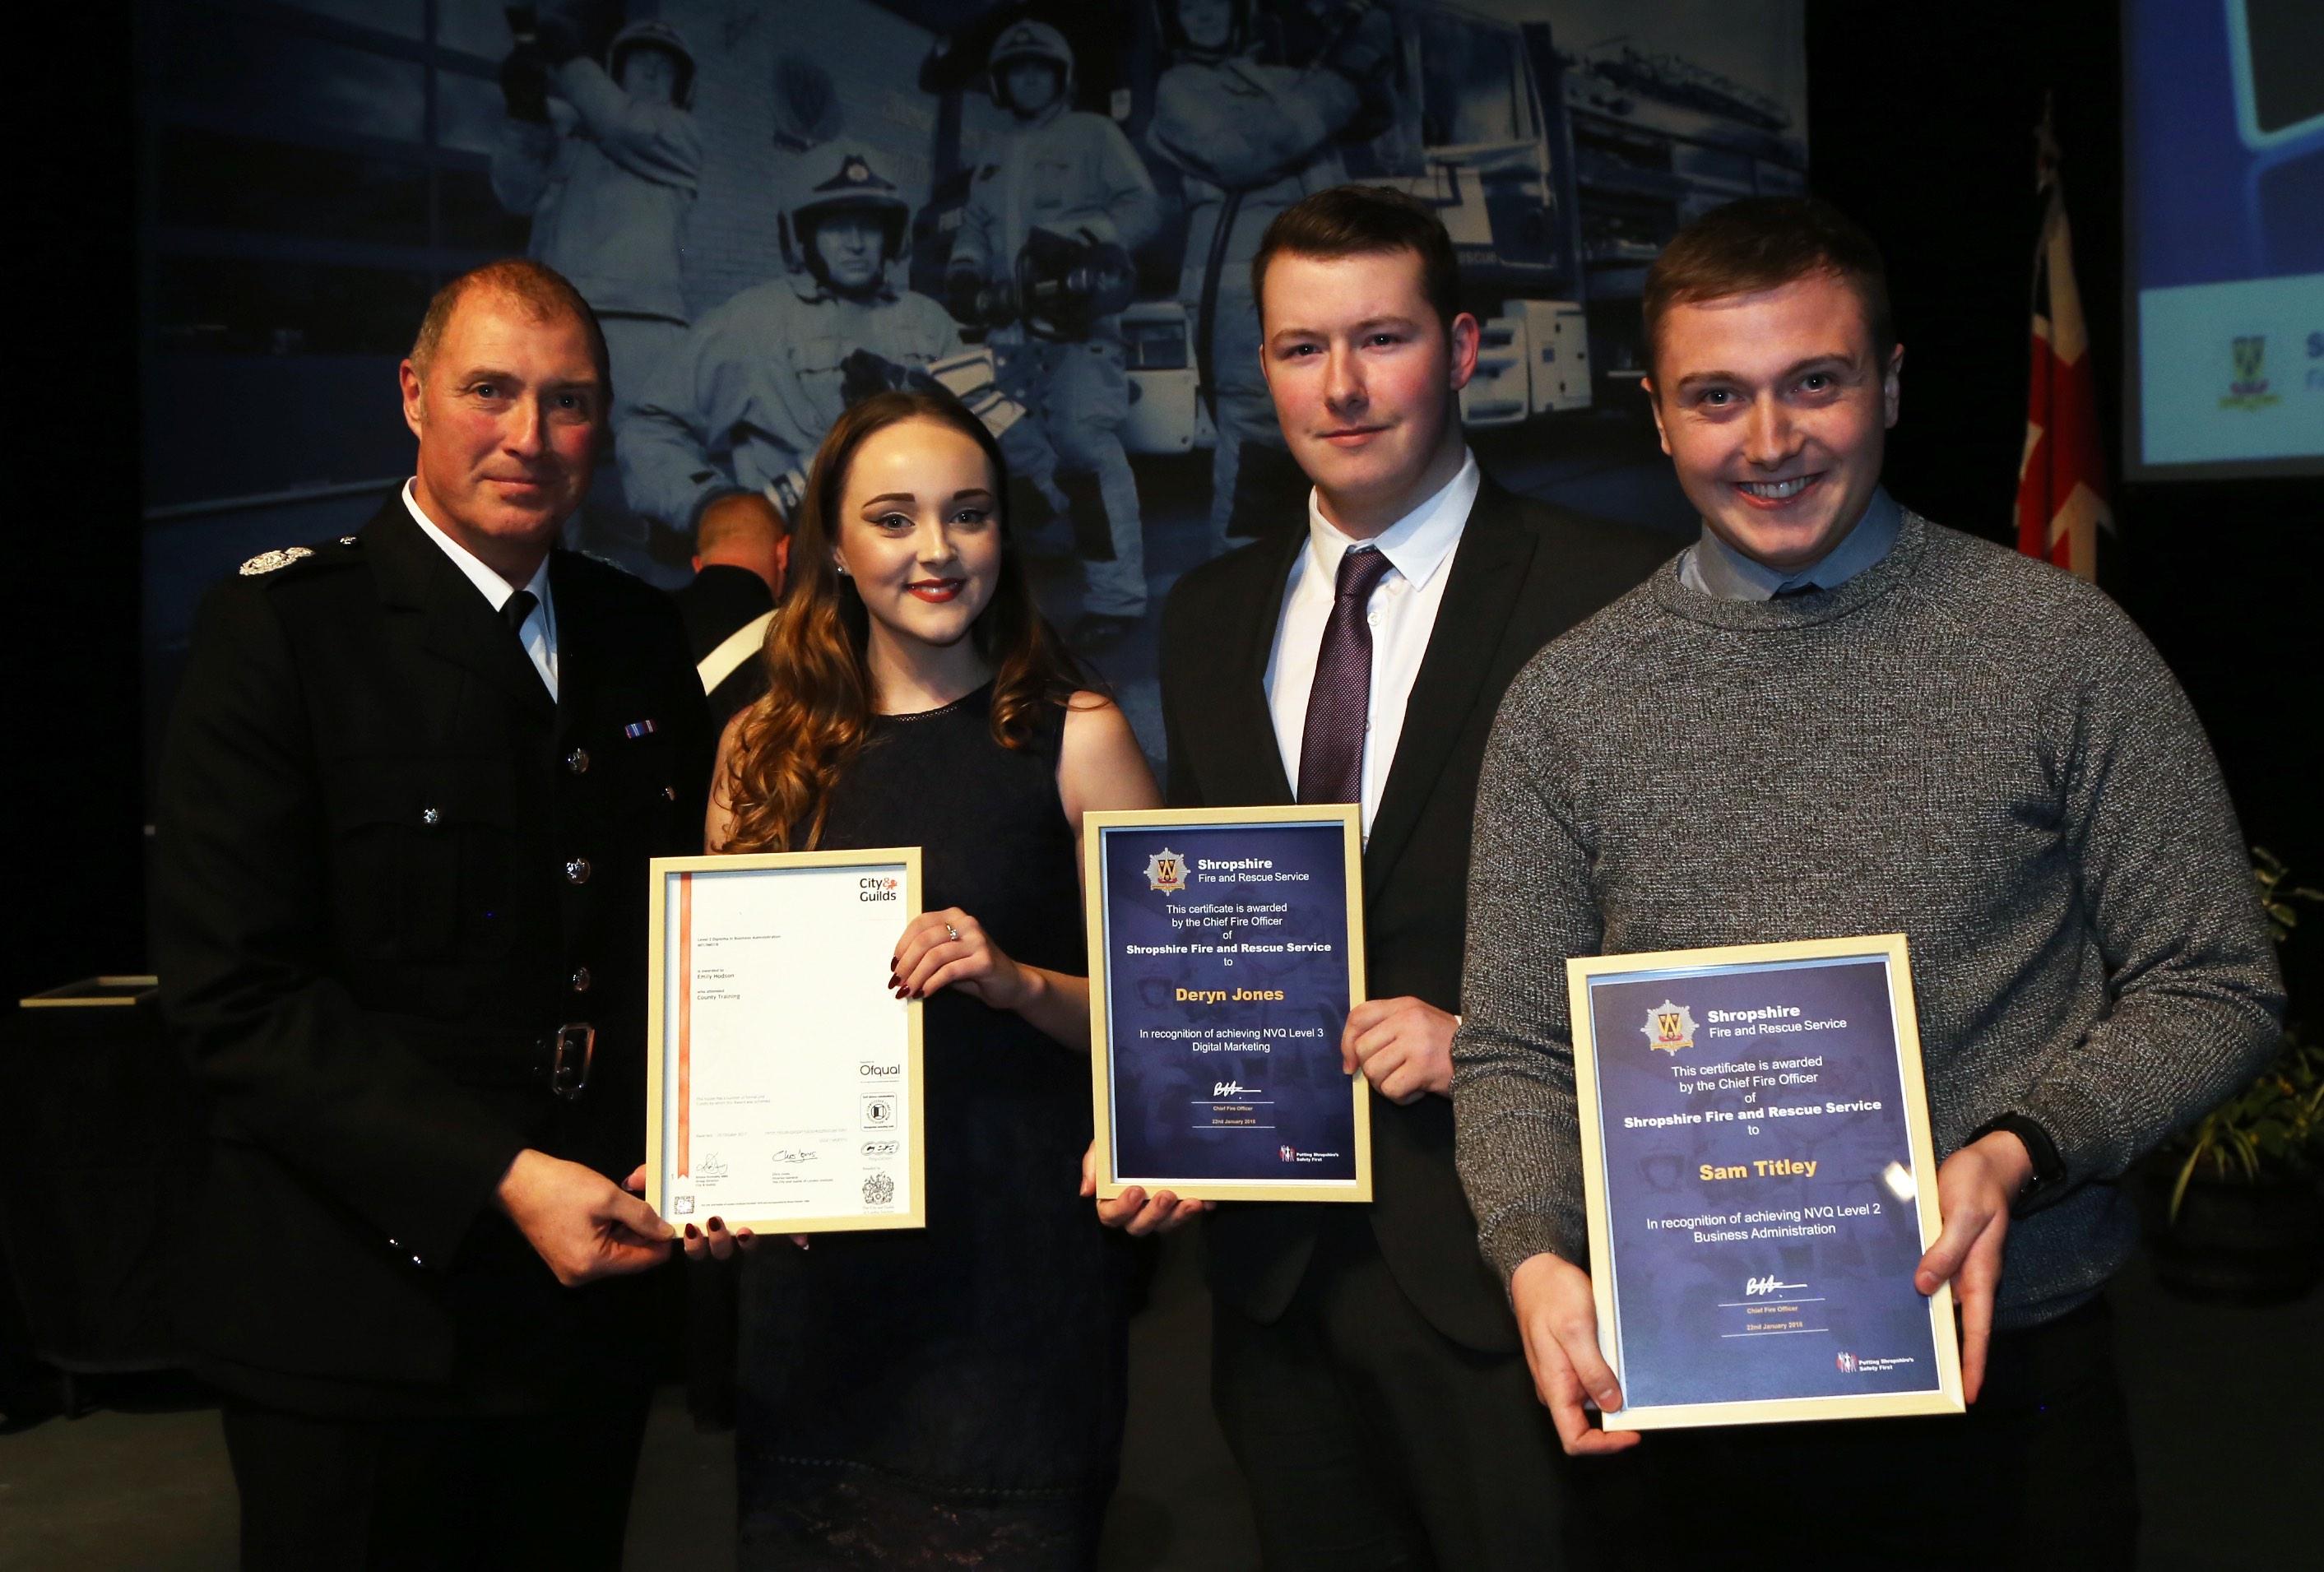 Apprentices Emily Hodson, Deryn Hughes and Sam Titley were praised for their achievements